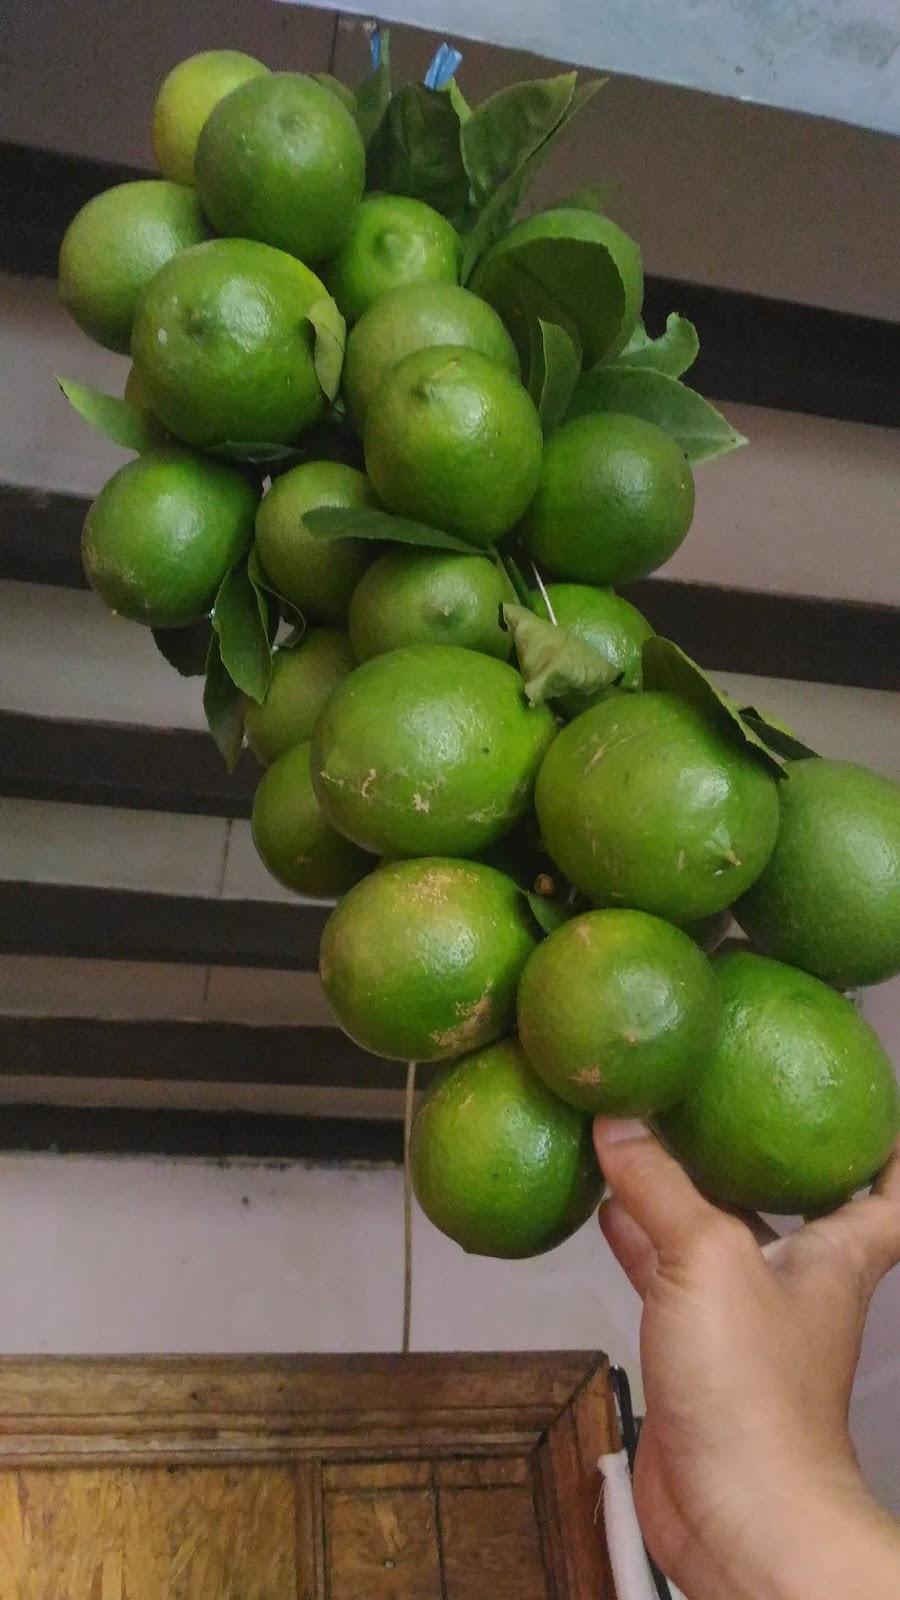 35 Manfaat Jeruk Lemon Berdasarkan Kajian Penelitian